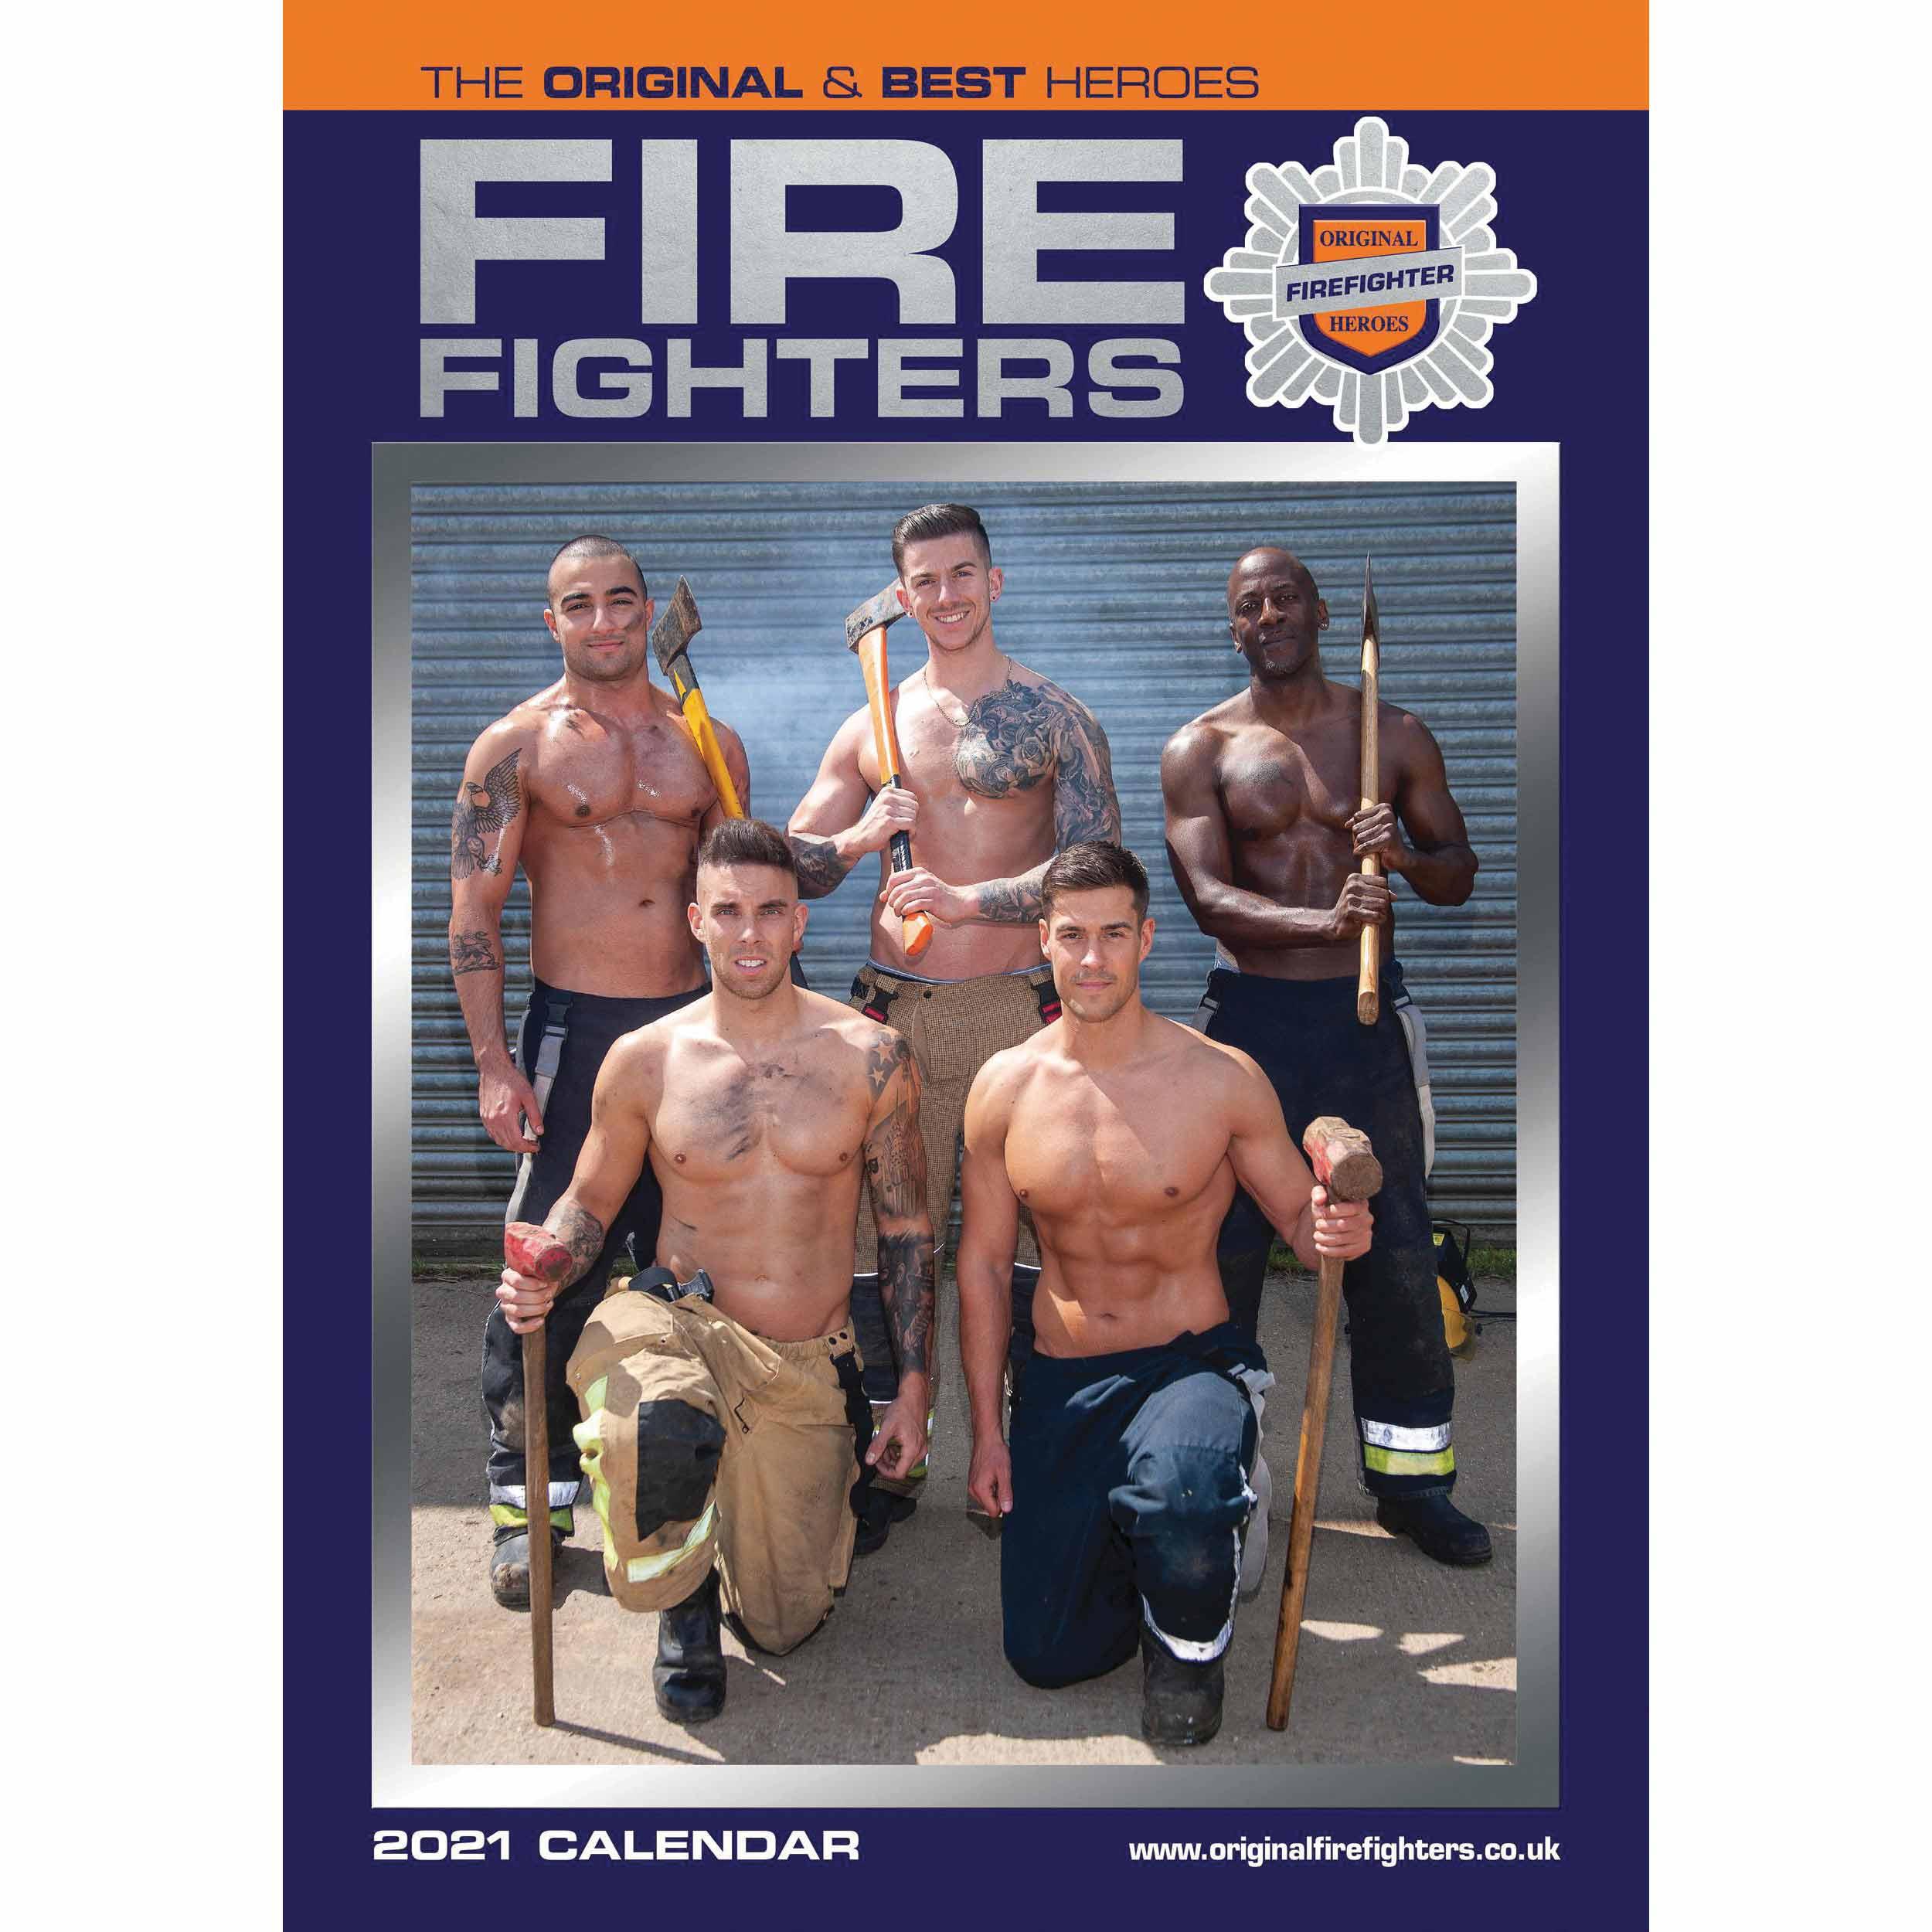 Firefighters A3 Calendar 2021 At Calendar Club Intended For Houston Fire 2021 Schuele